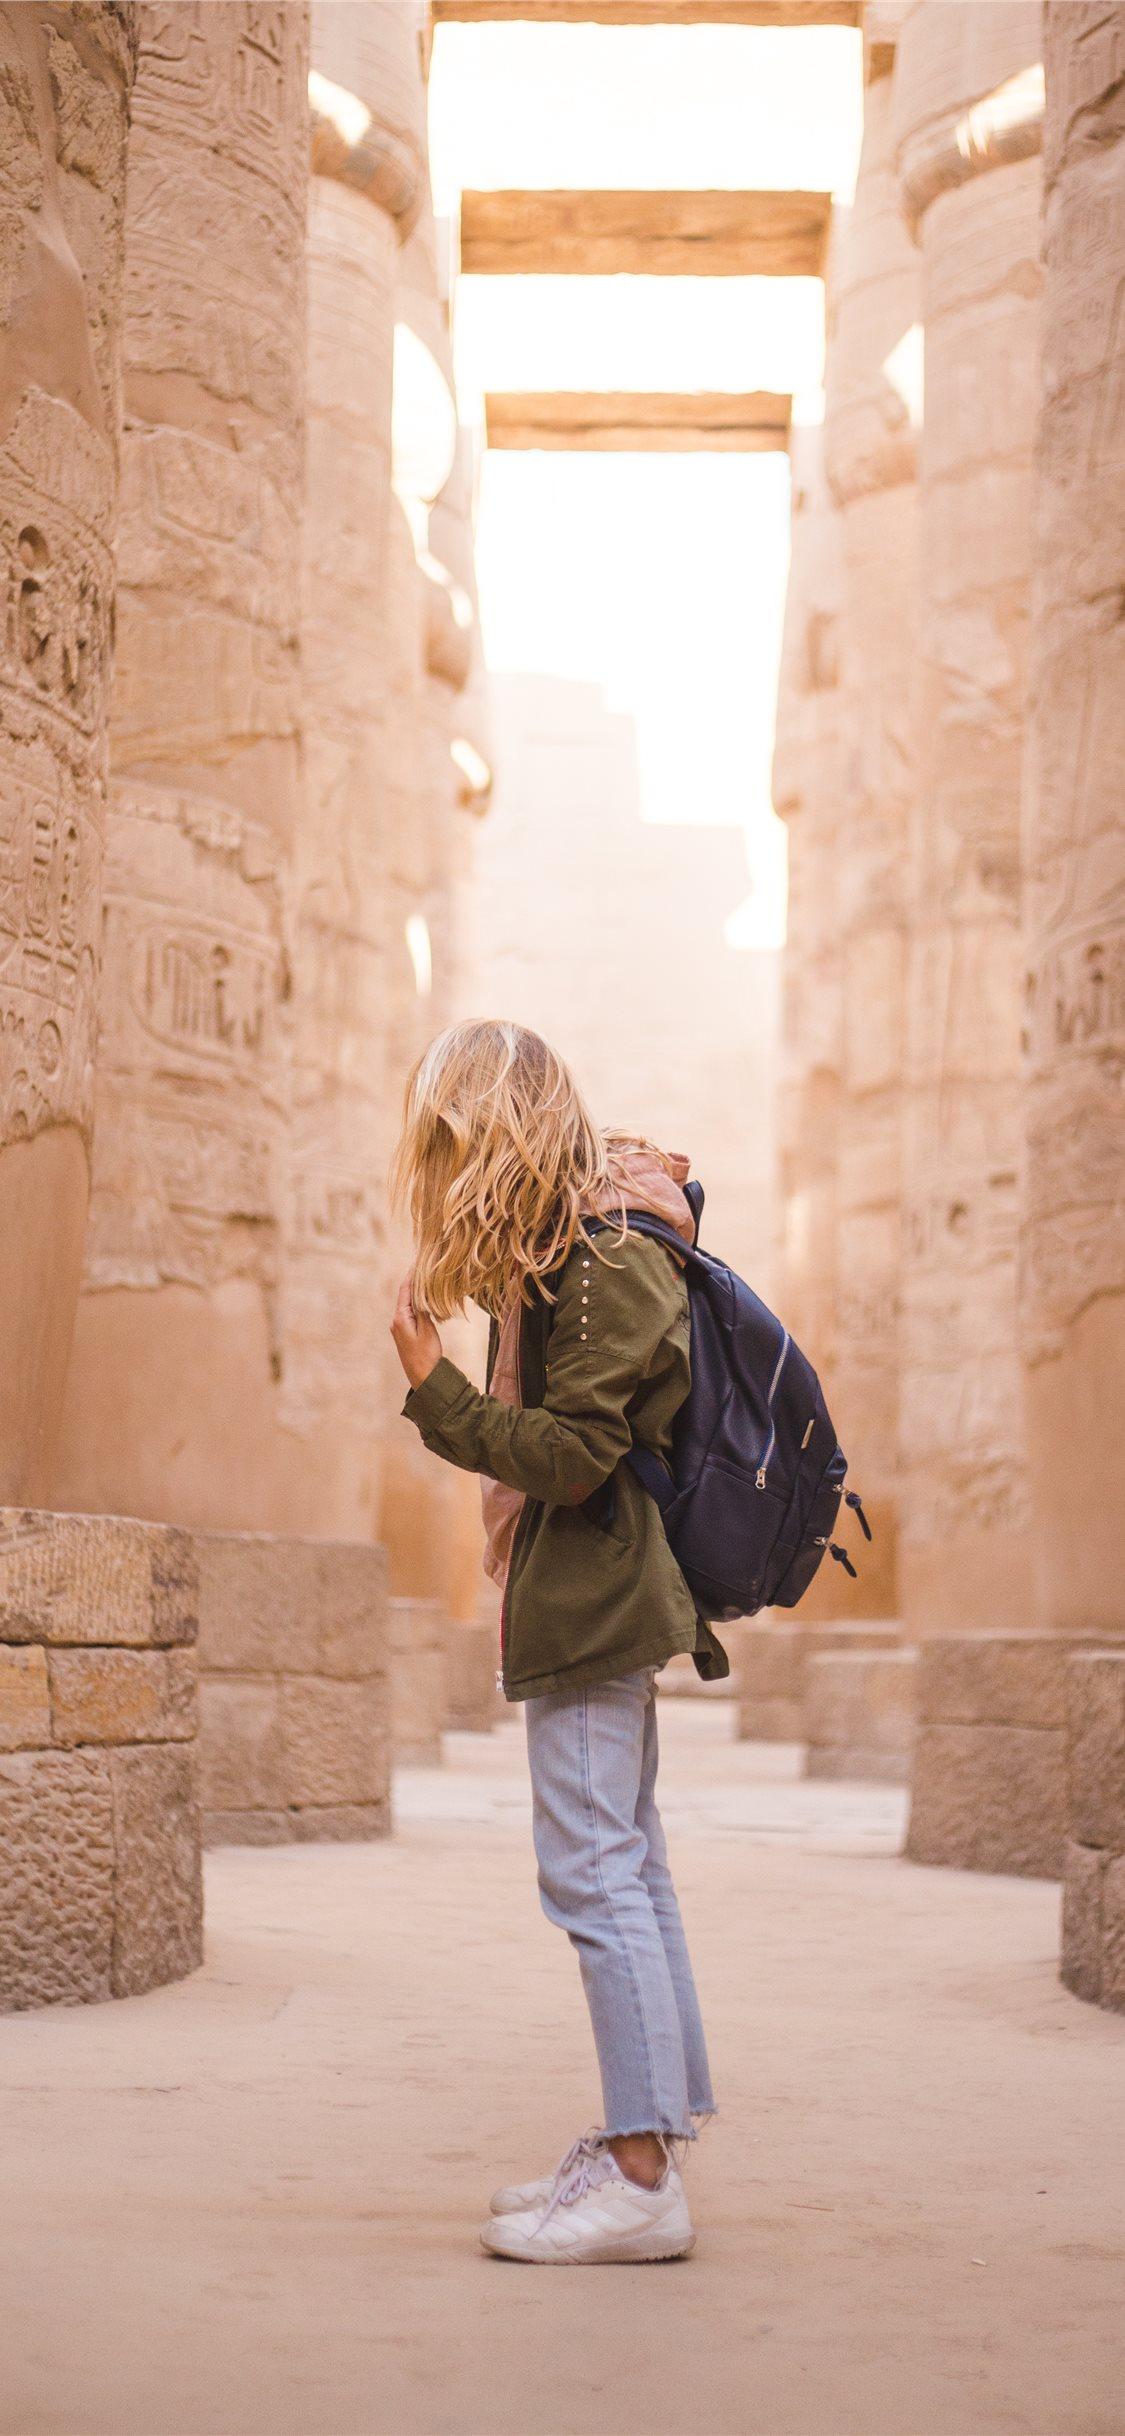 Karnak Egypt Iphone X Wallpapers Free Download